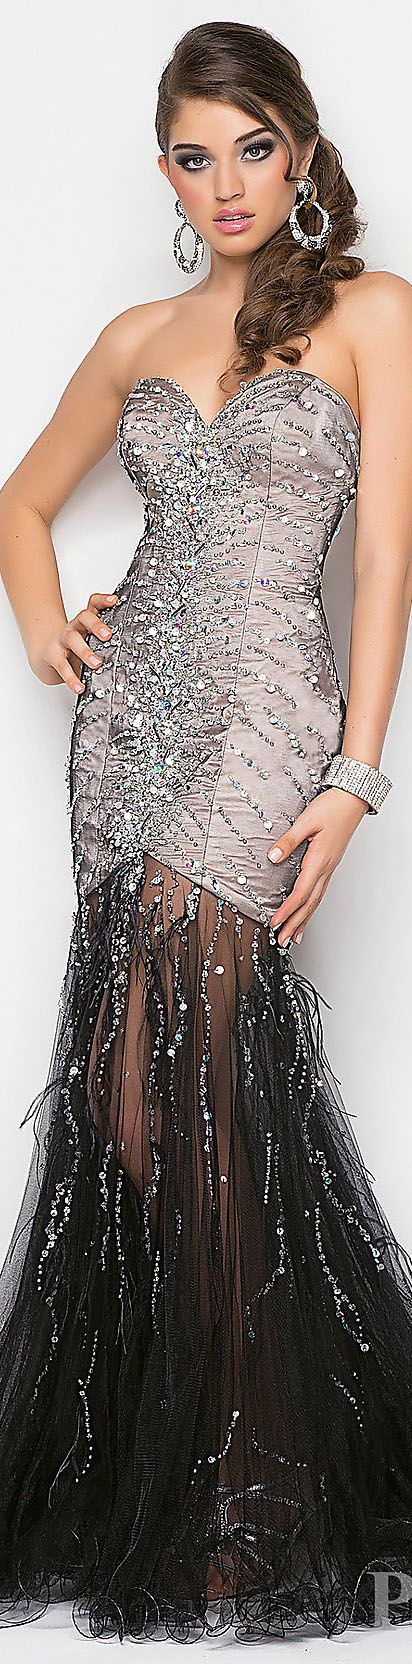 Fashion long formal dress #strapless #glitter #sexy